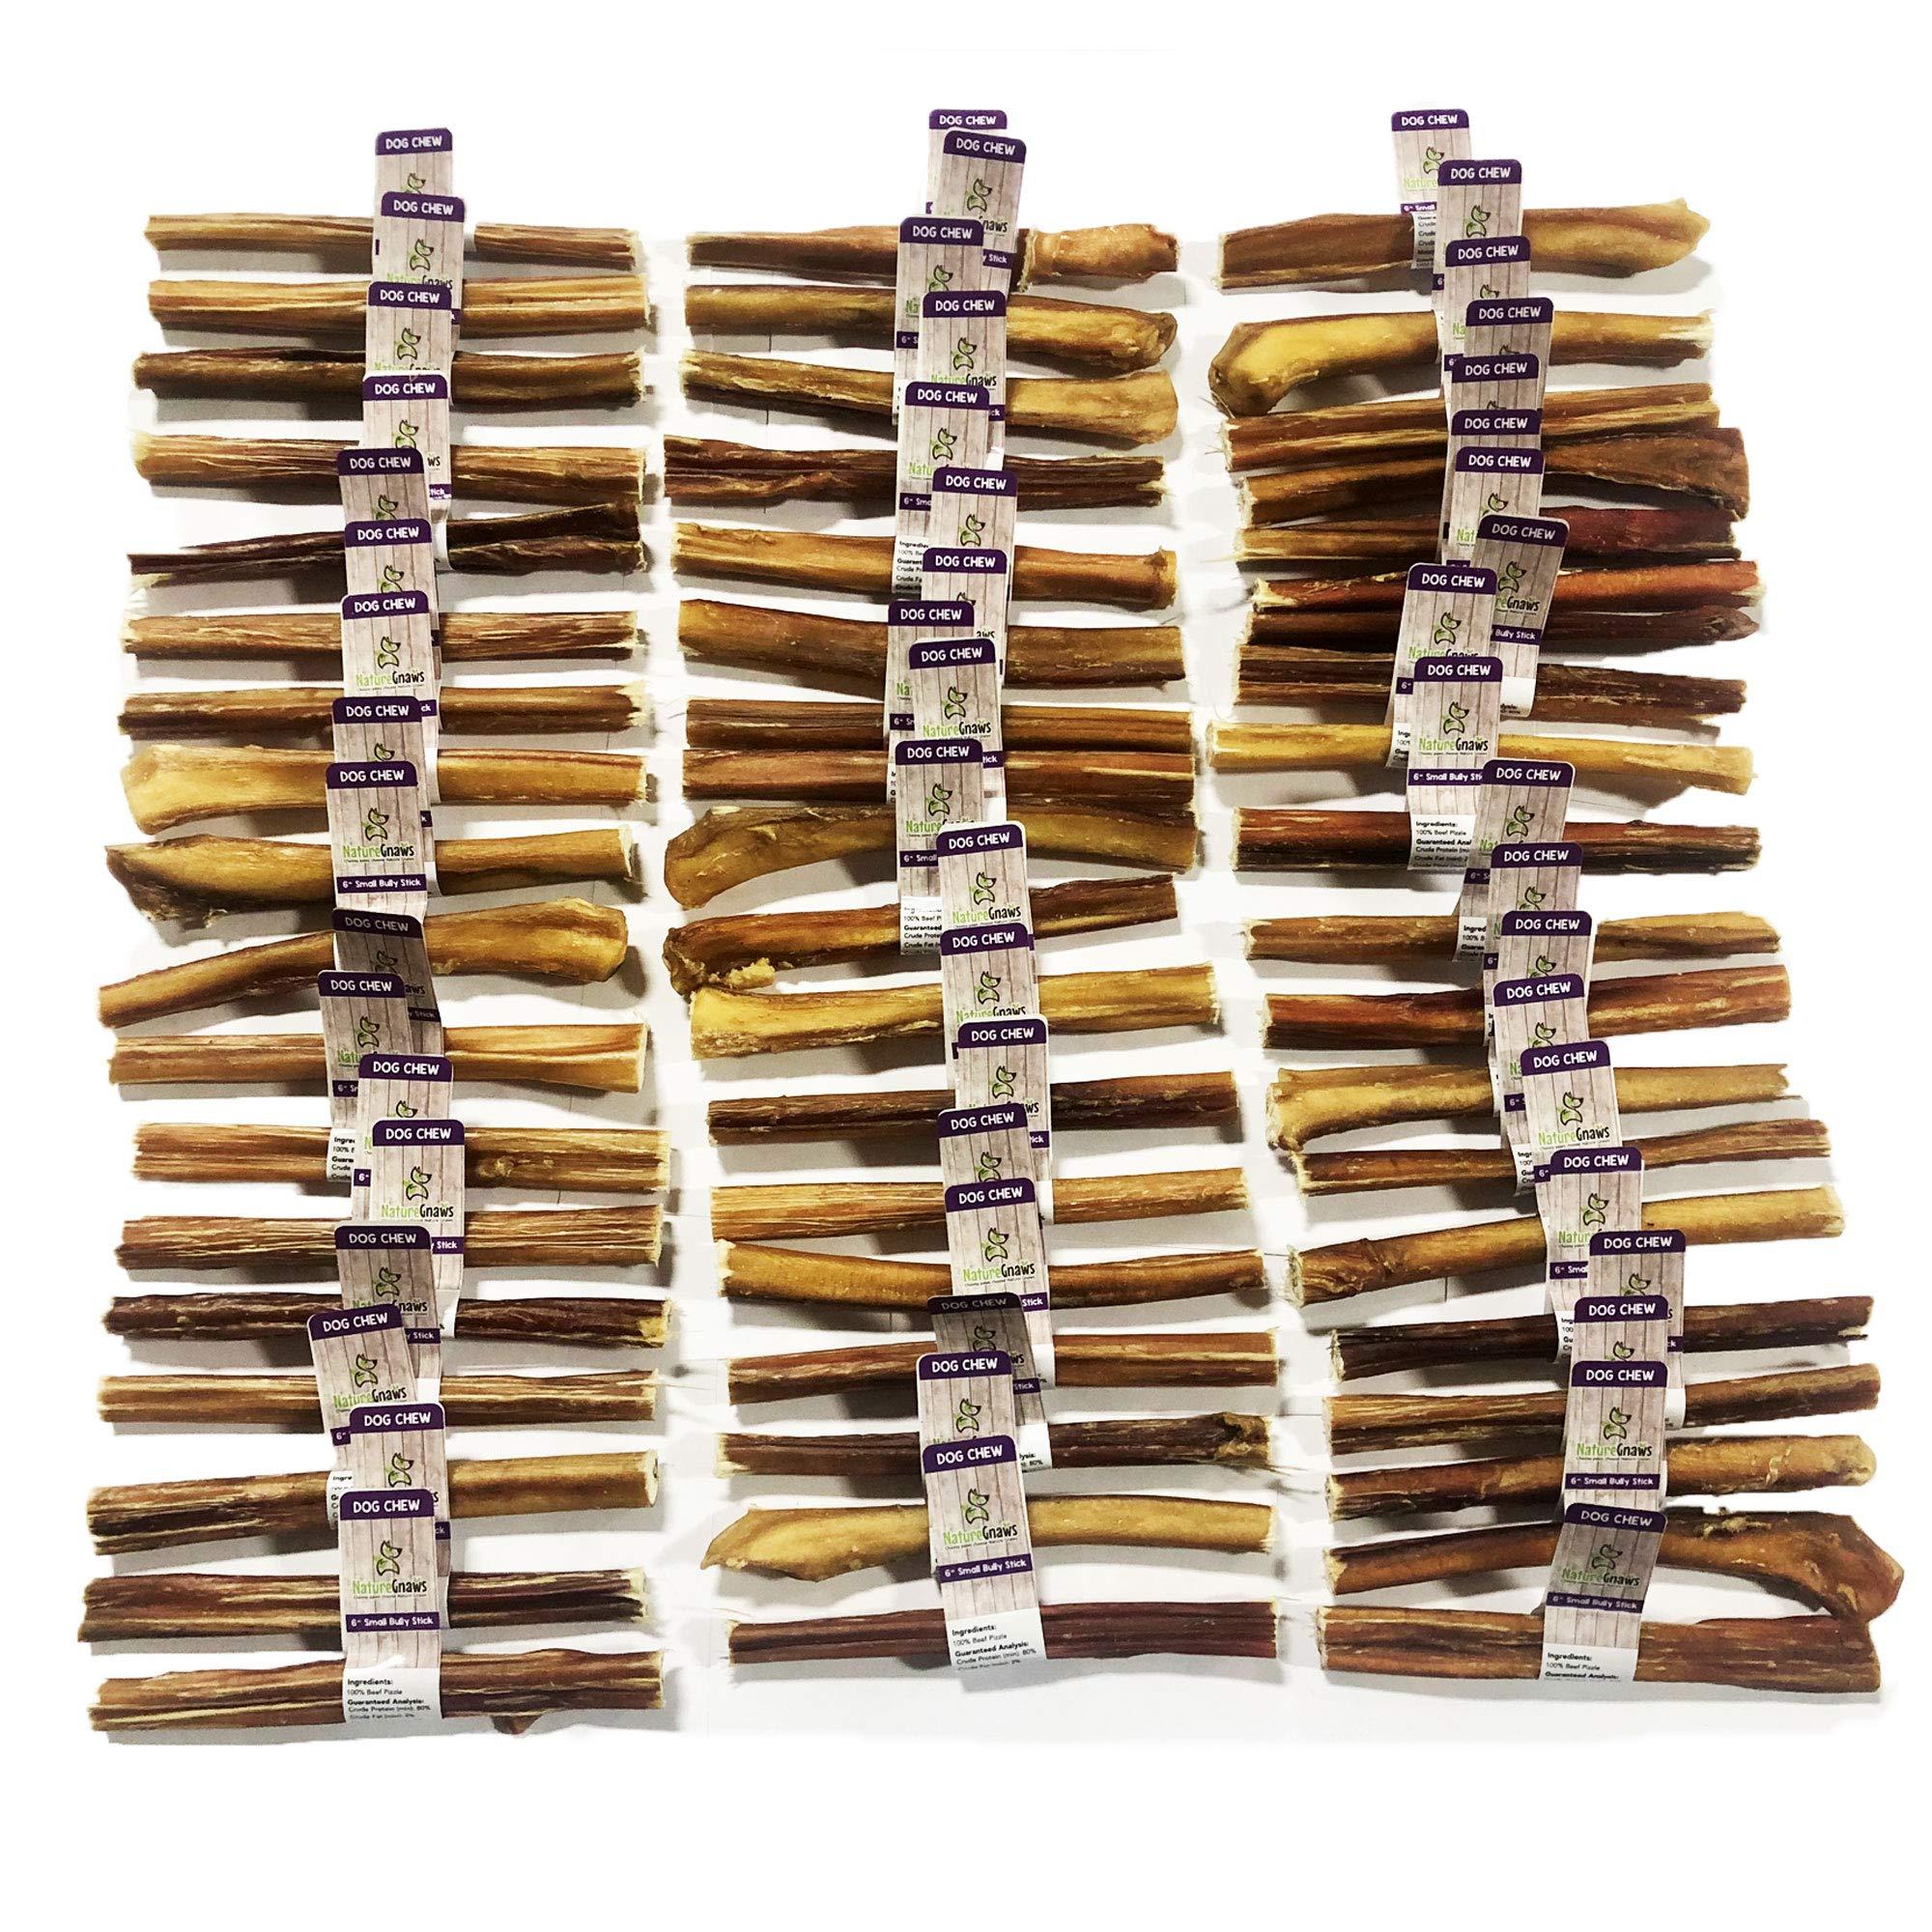 Nature Gnaws Small Bully Sticks (Bulk Box 150 Count) - 100% All-Natural Grass-Fed Free-Range Premium Beef Dog Chews